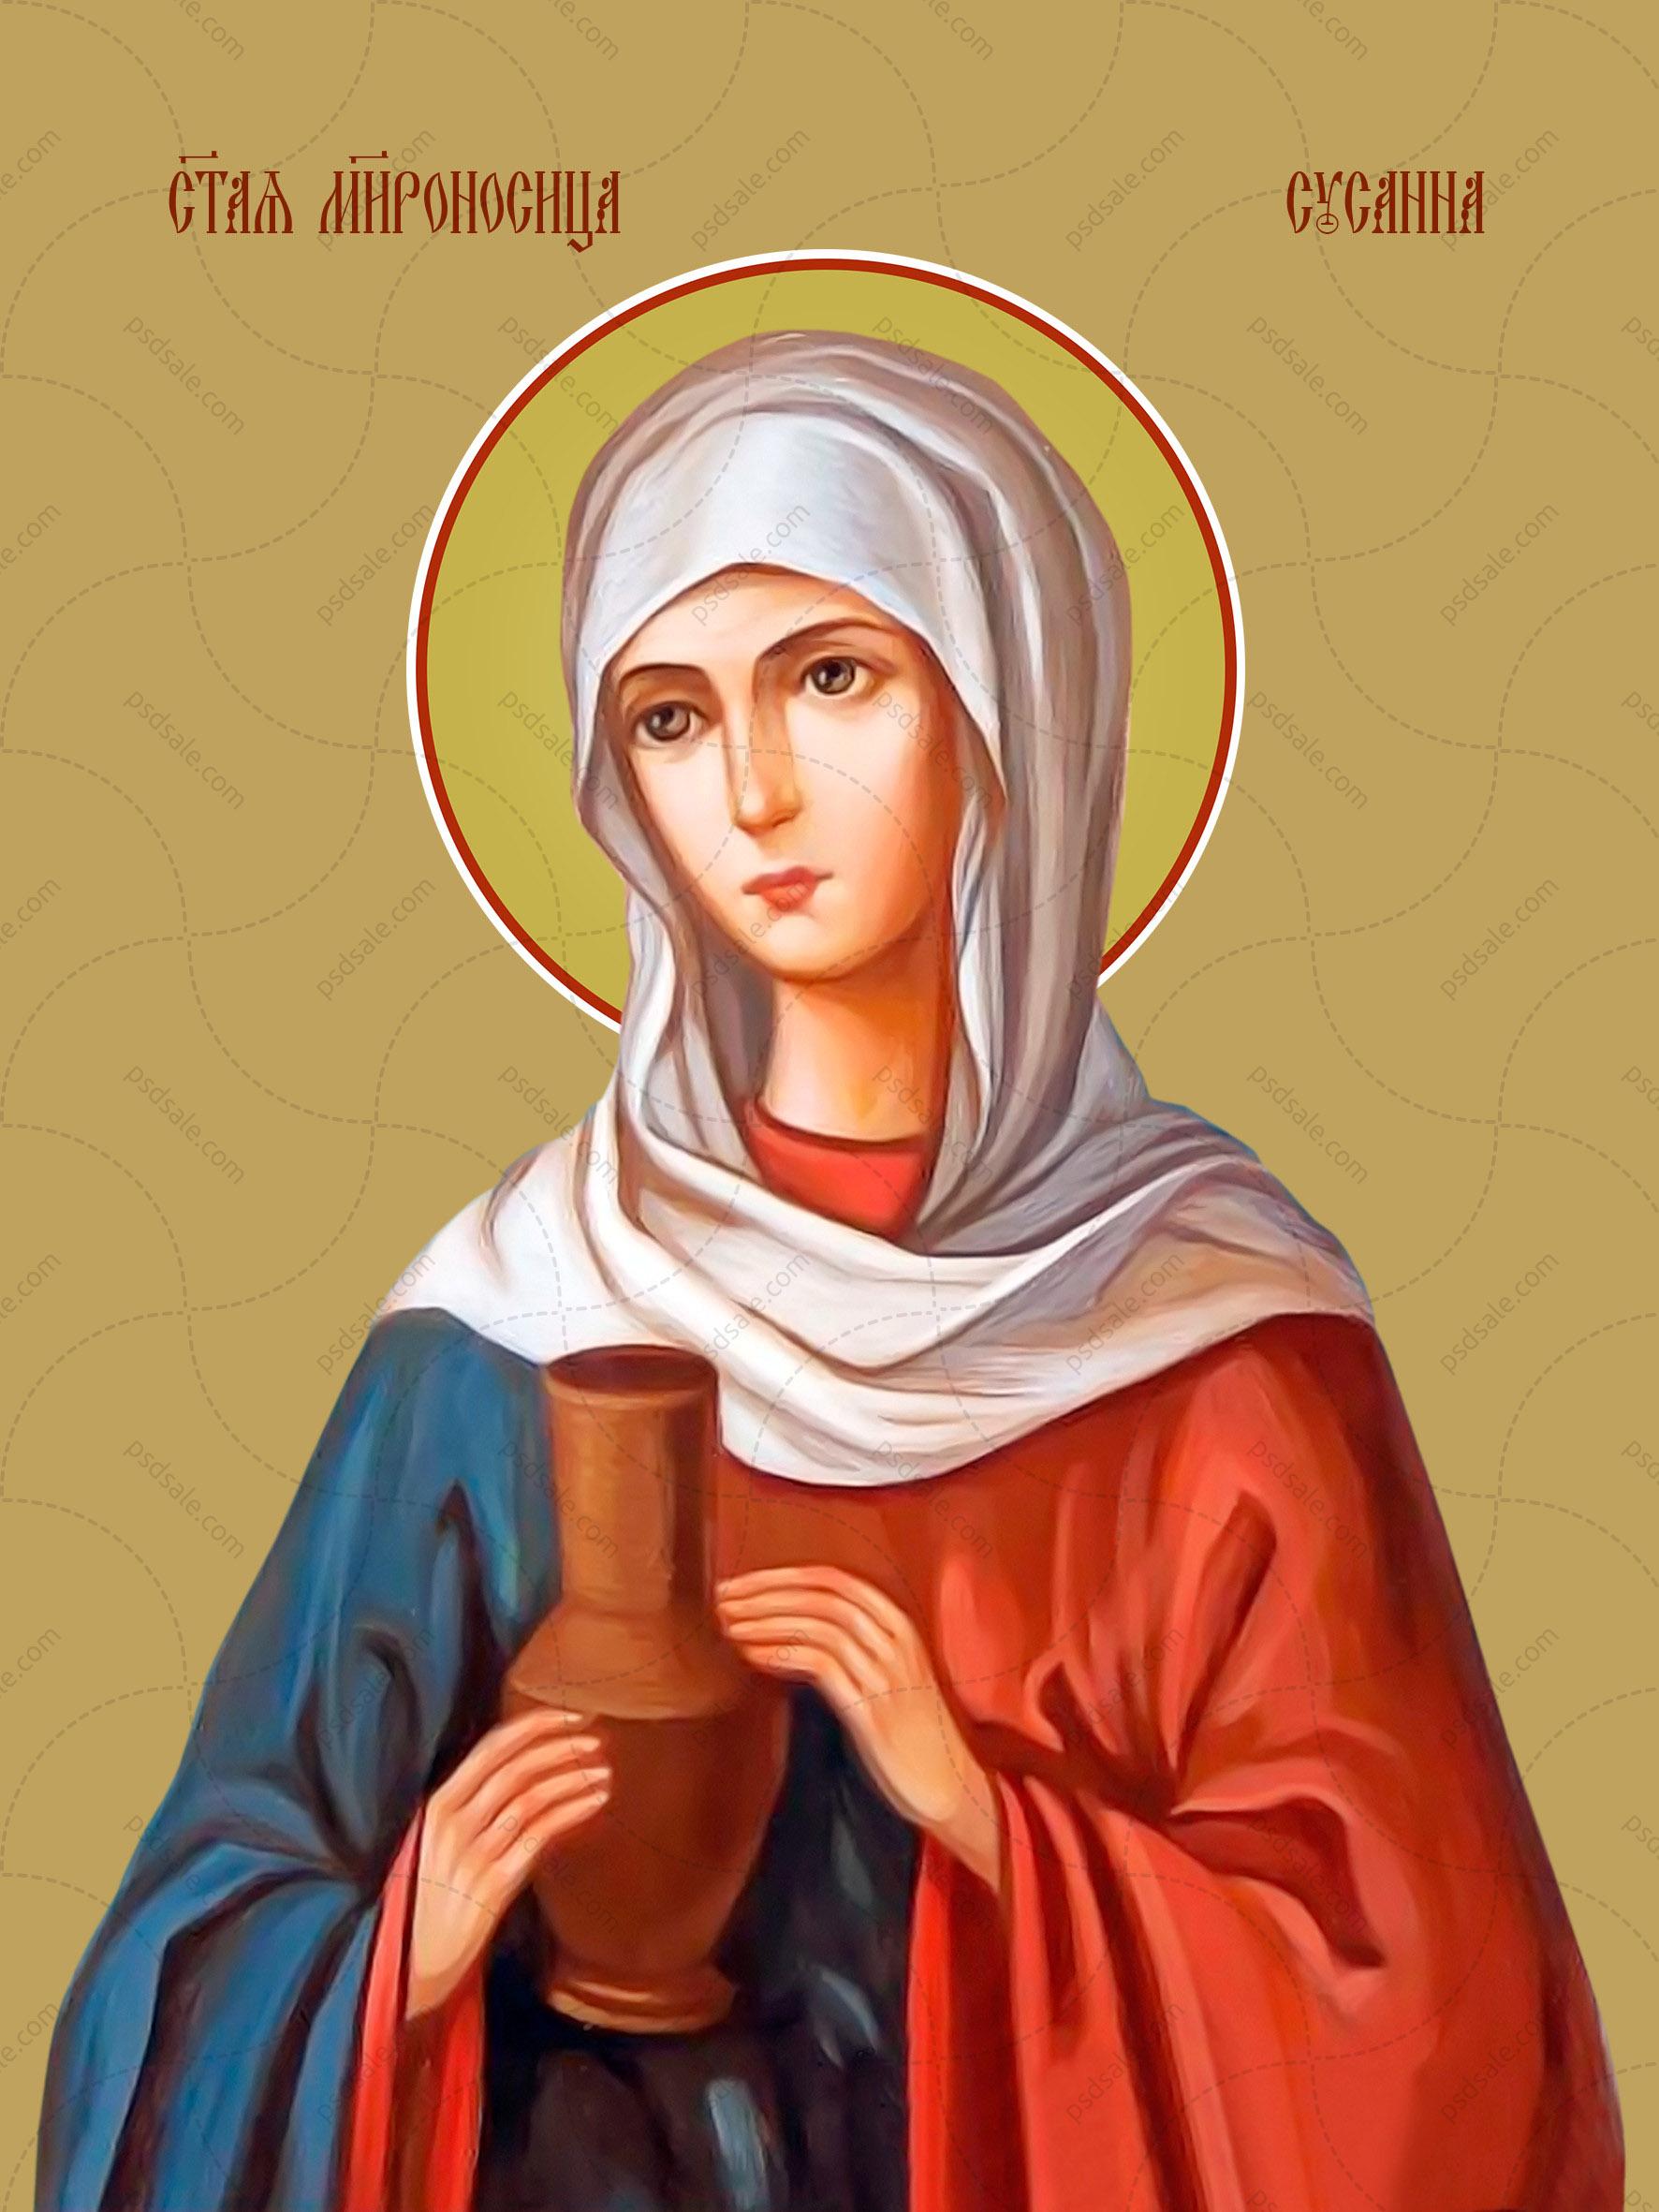 Сусанна Мироносица, святая